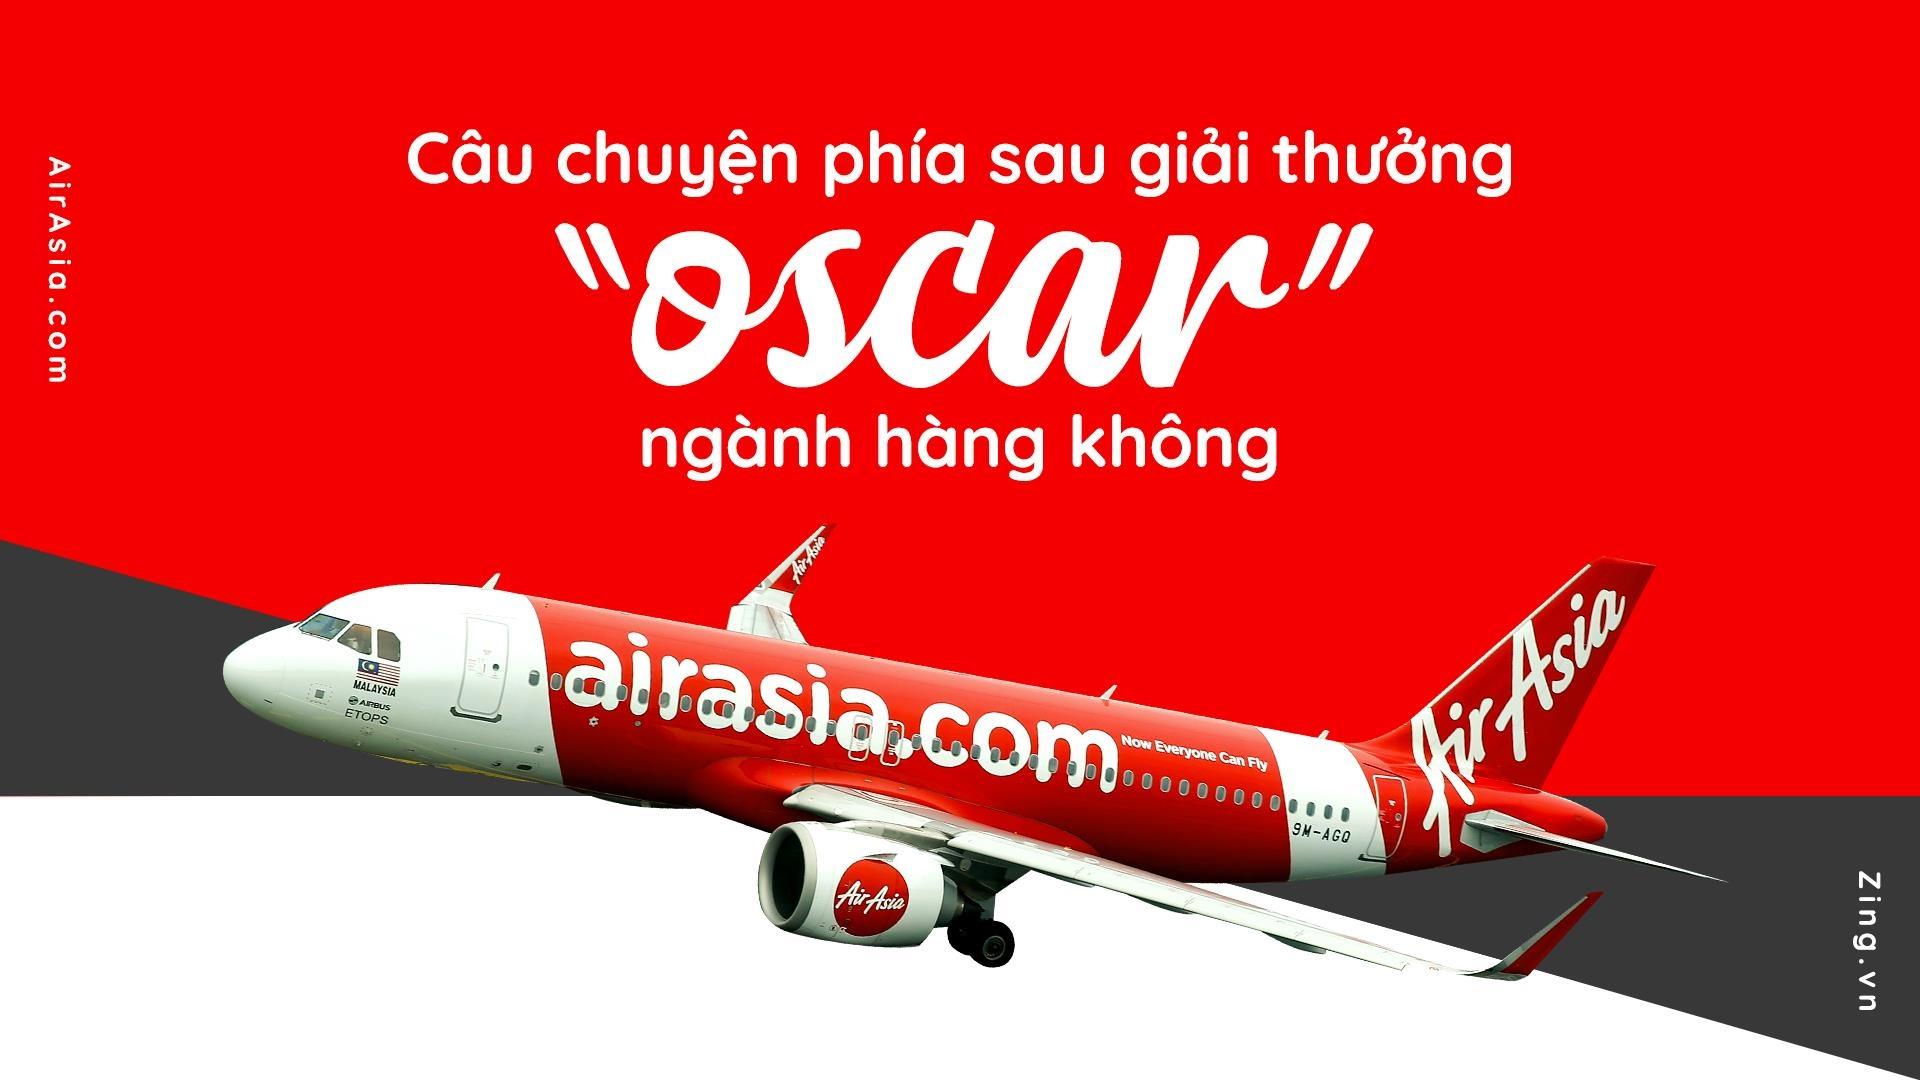 AirAsia anh 2